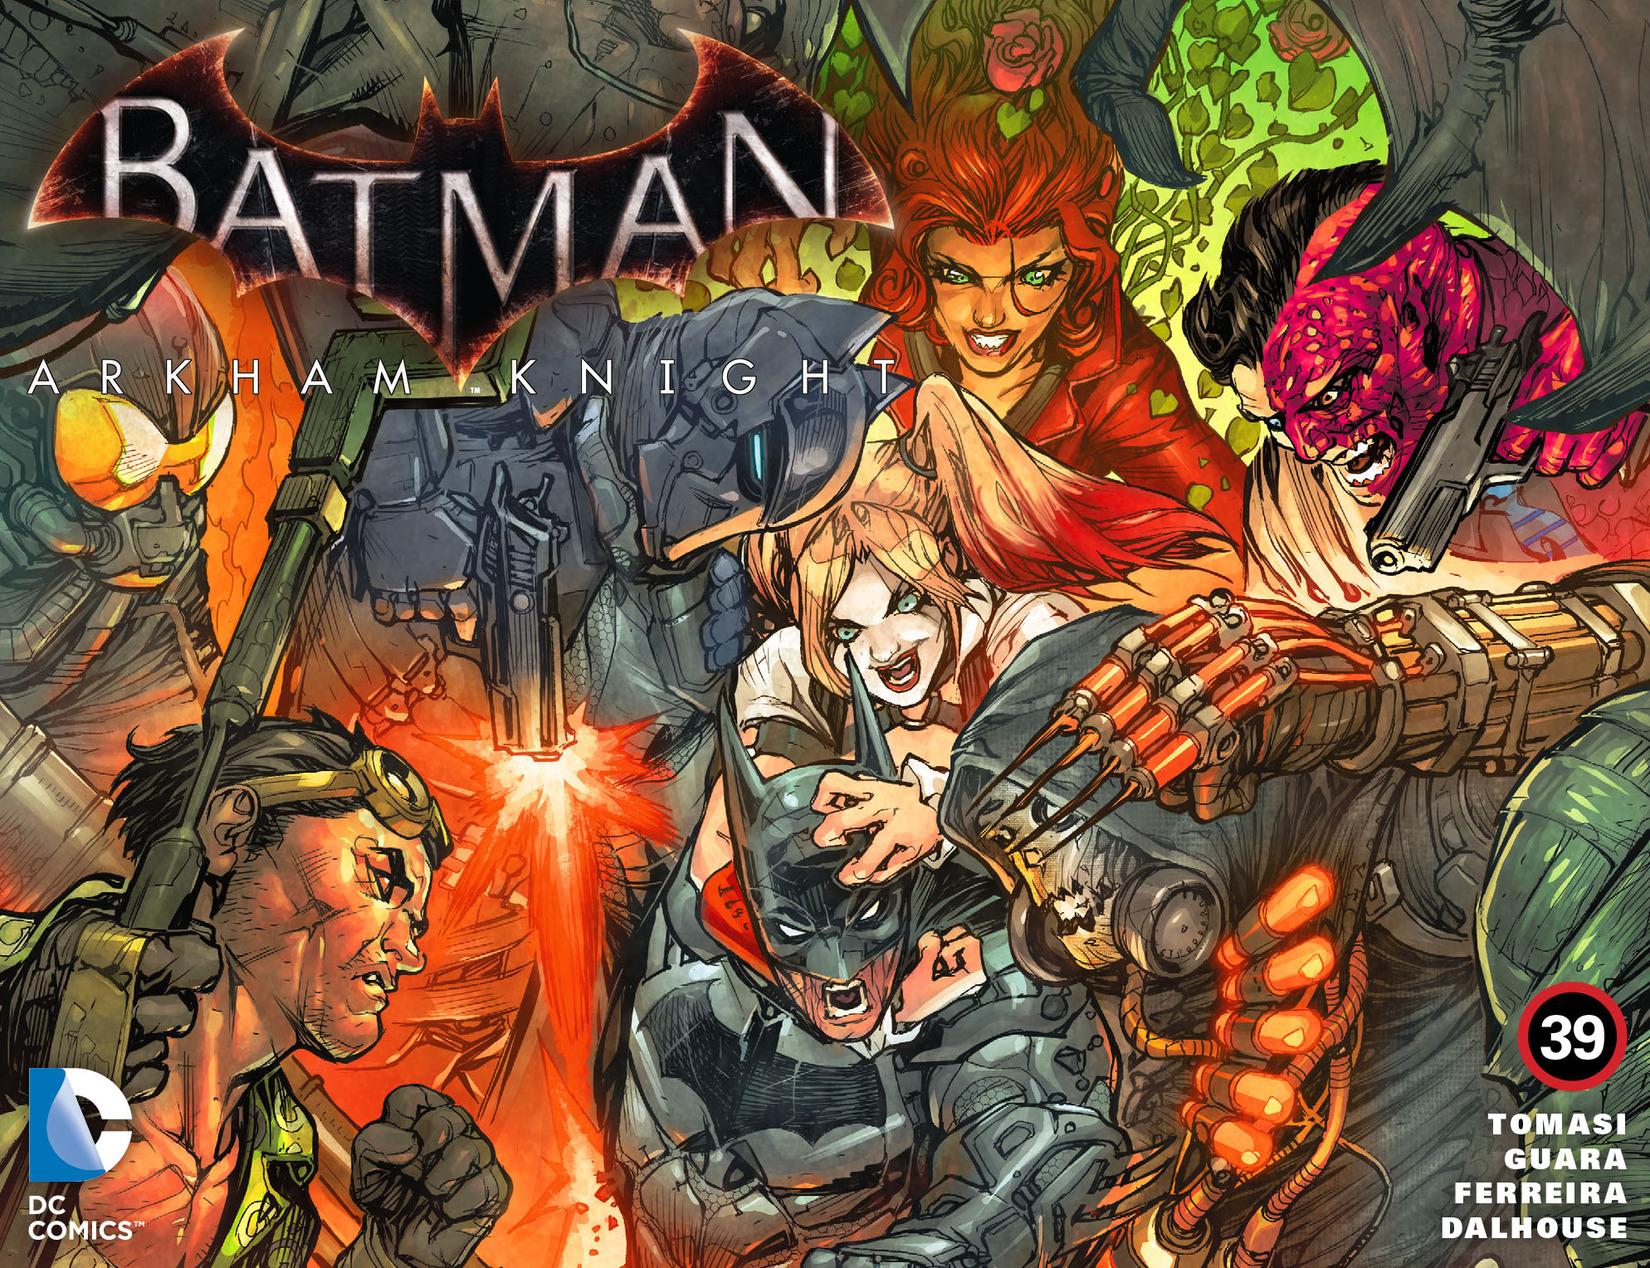 Batman: Arkham Knight [I] chap 39 pic 1